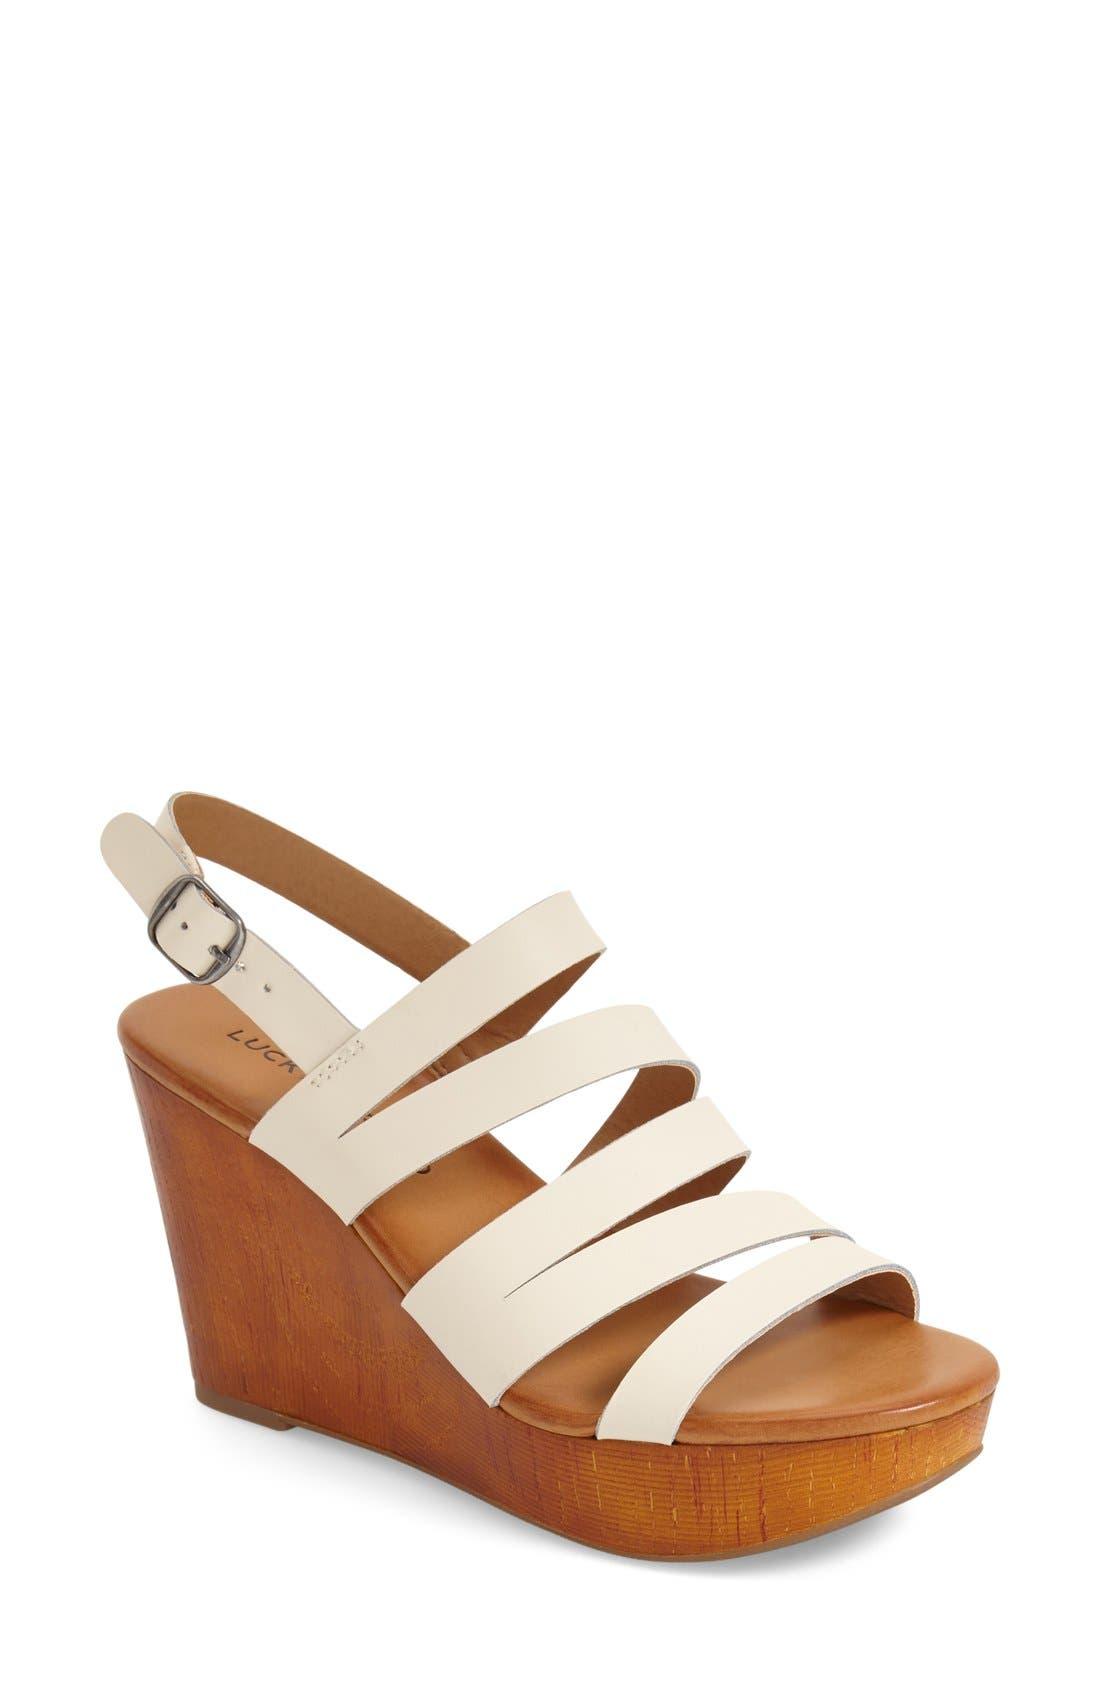 Alternate Image 1 Selected - Lucky Brand 'Marinaa' Wedge Sandal (Women)